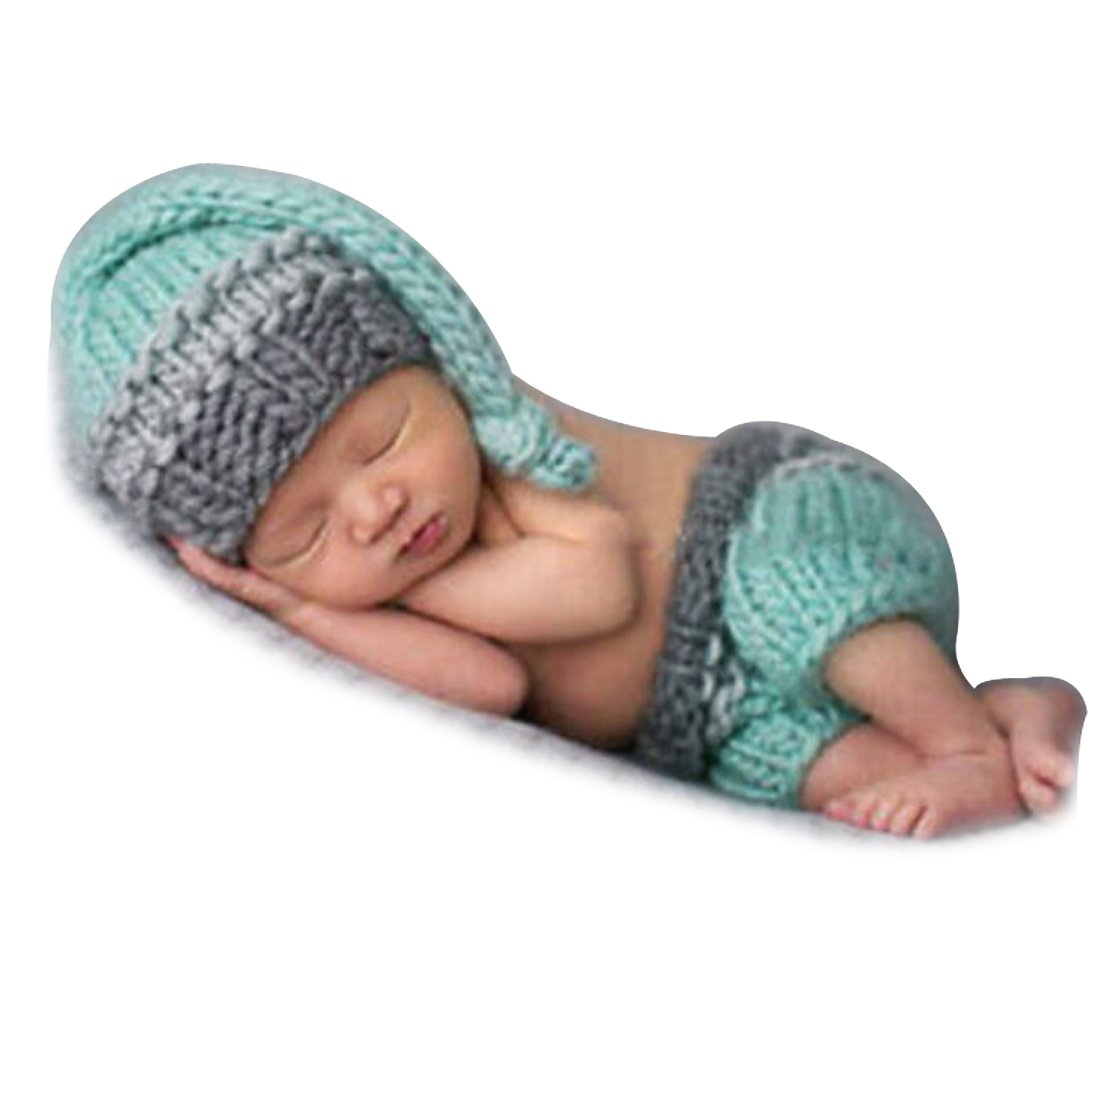 Tiaobug Neugeborene Baby Kostüm Foto Fotografie Hut Set Junge Kostüm ...